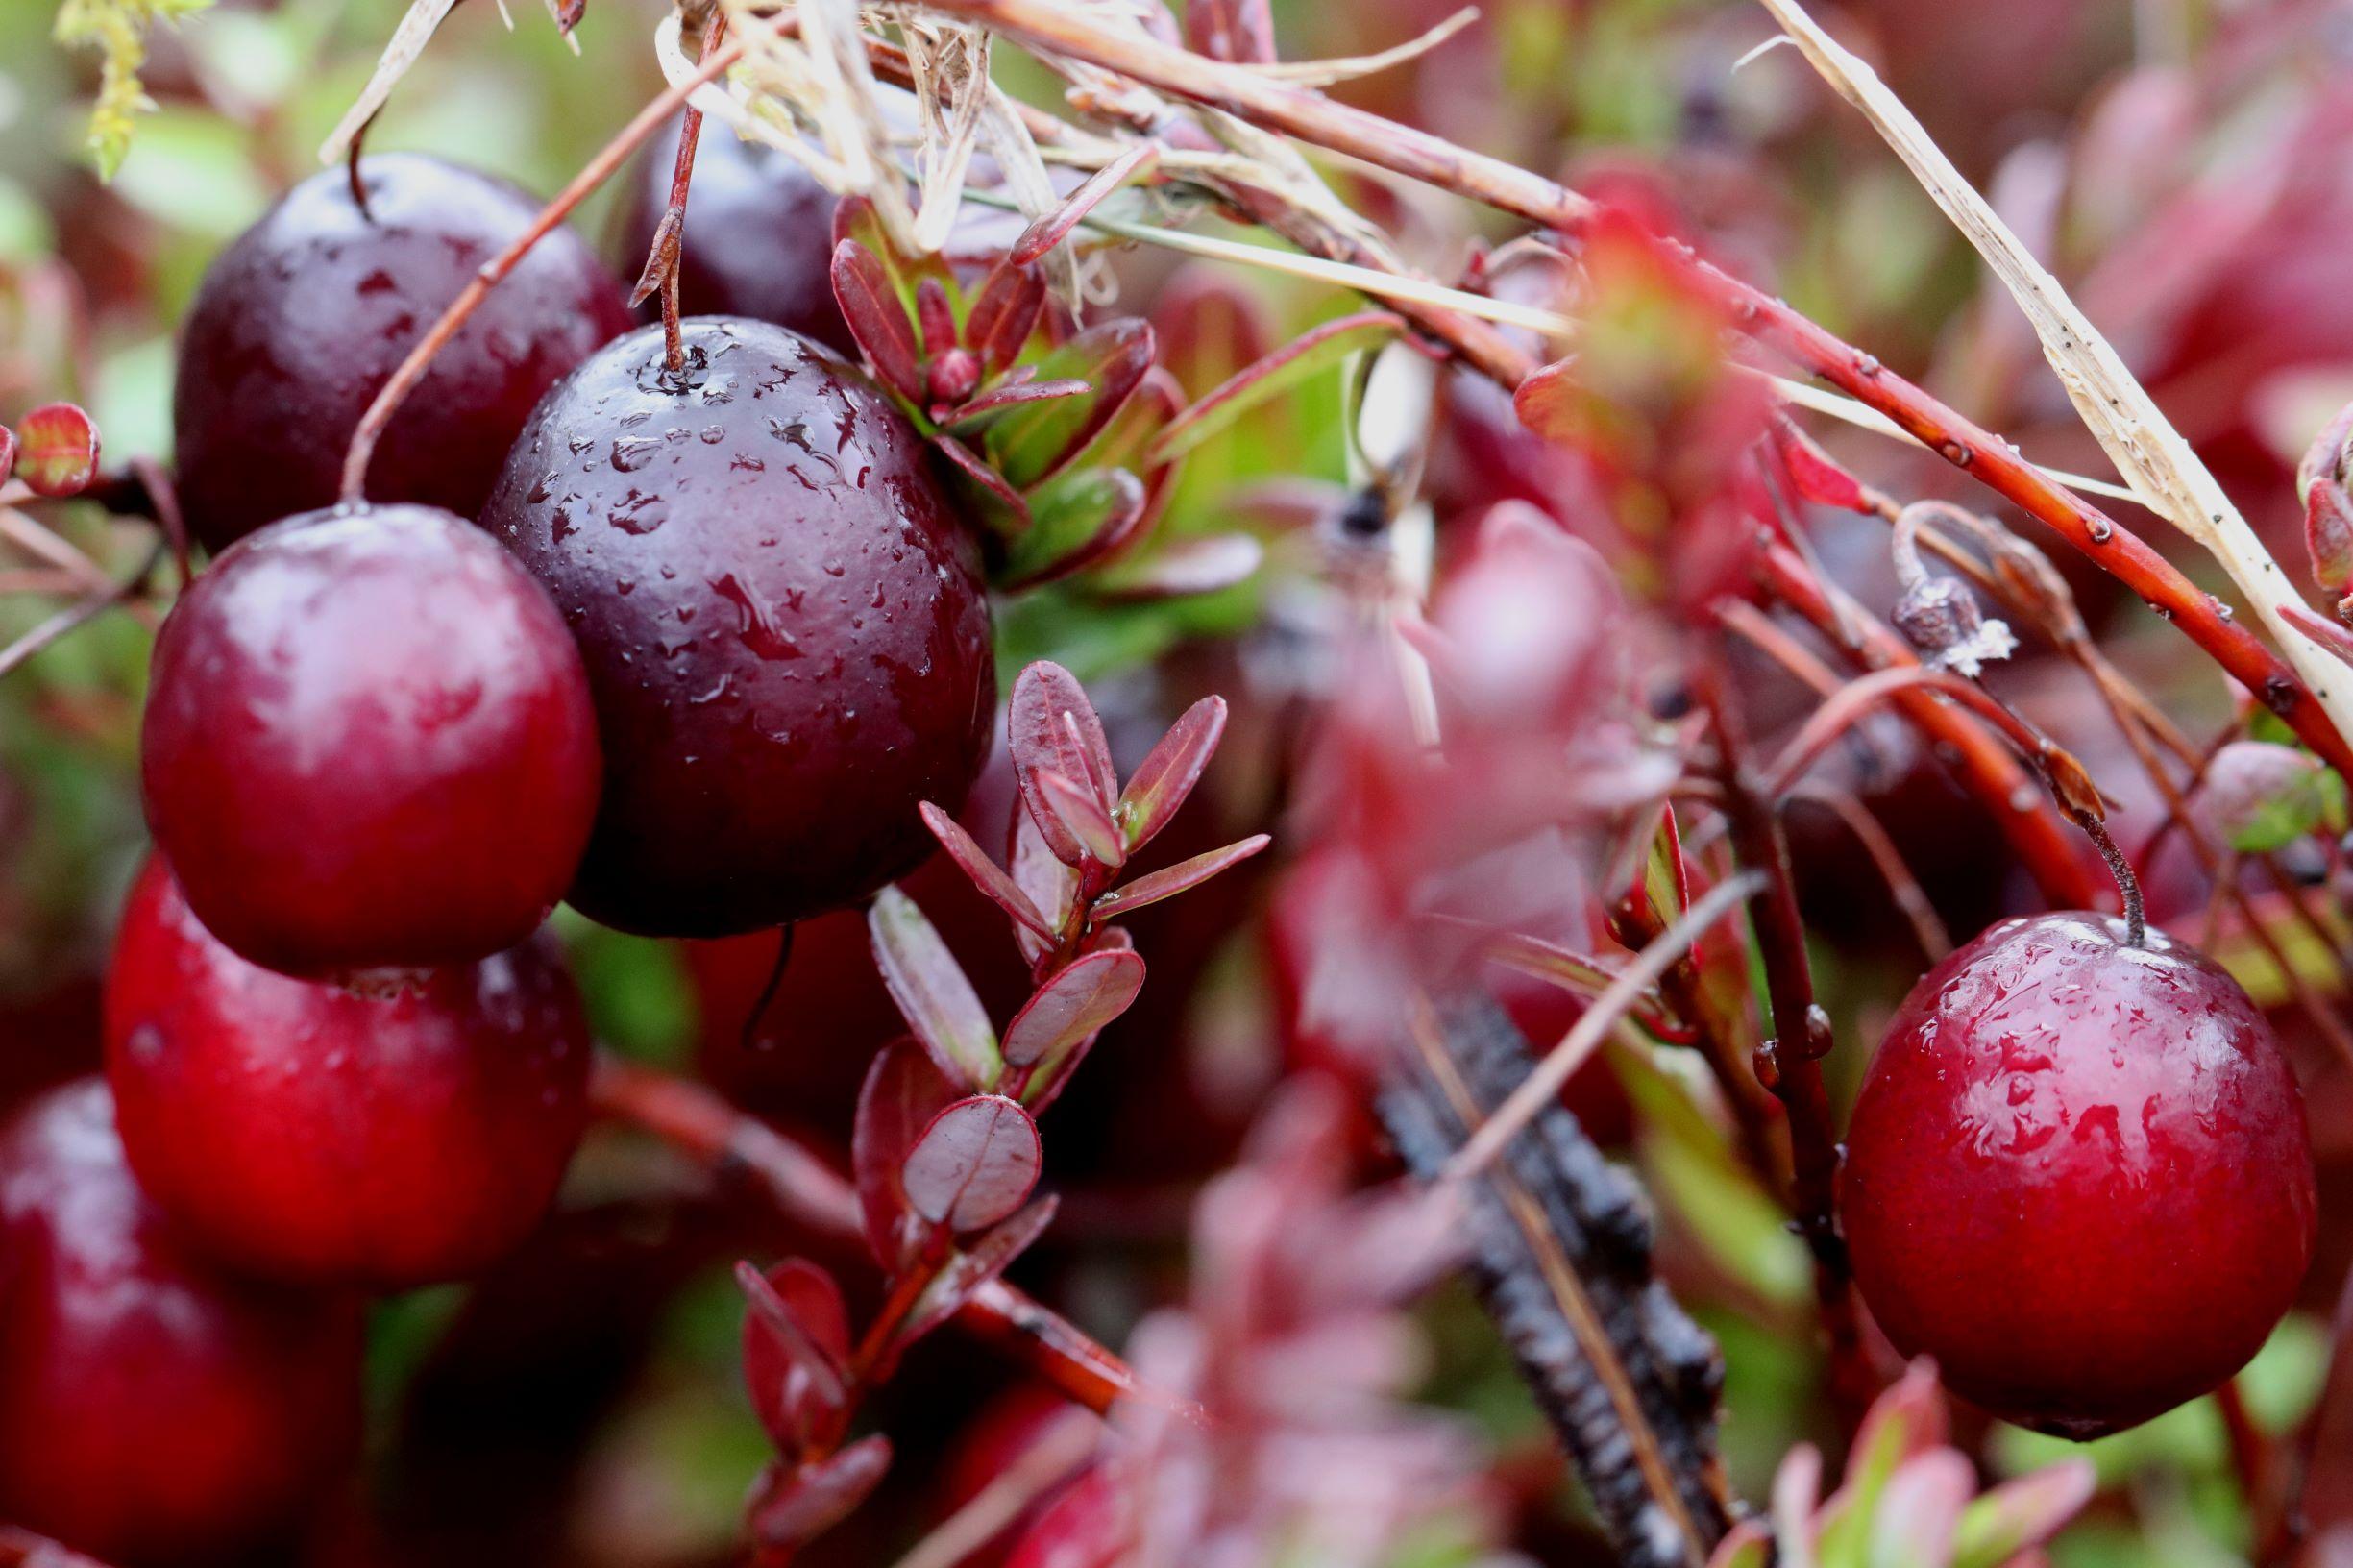 cranberry ripe on vine